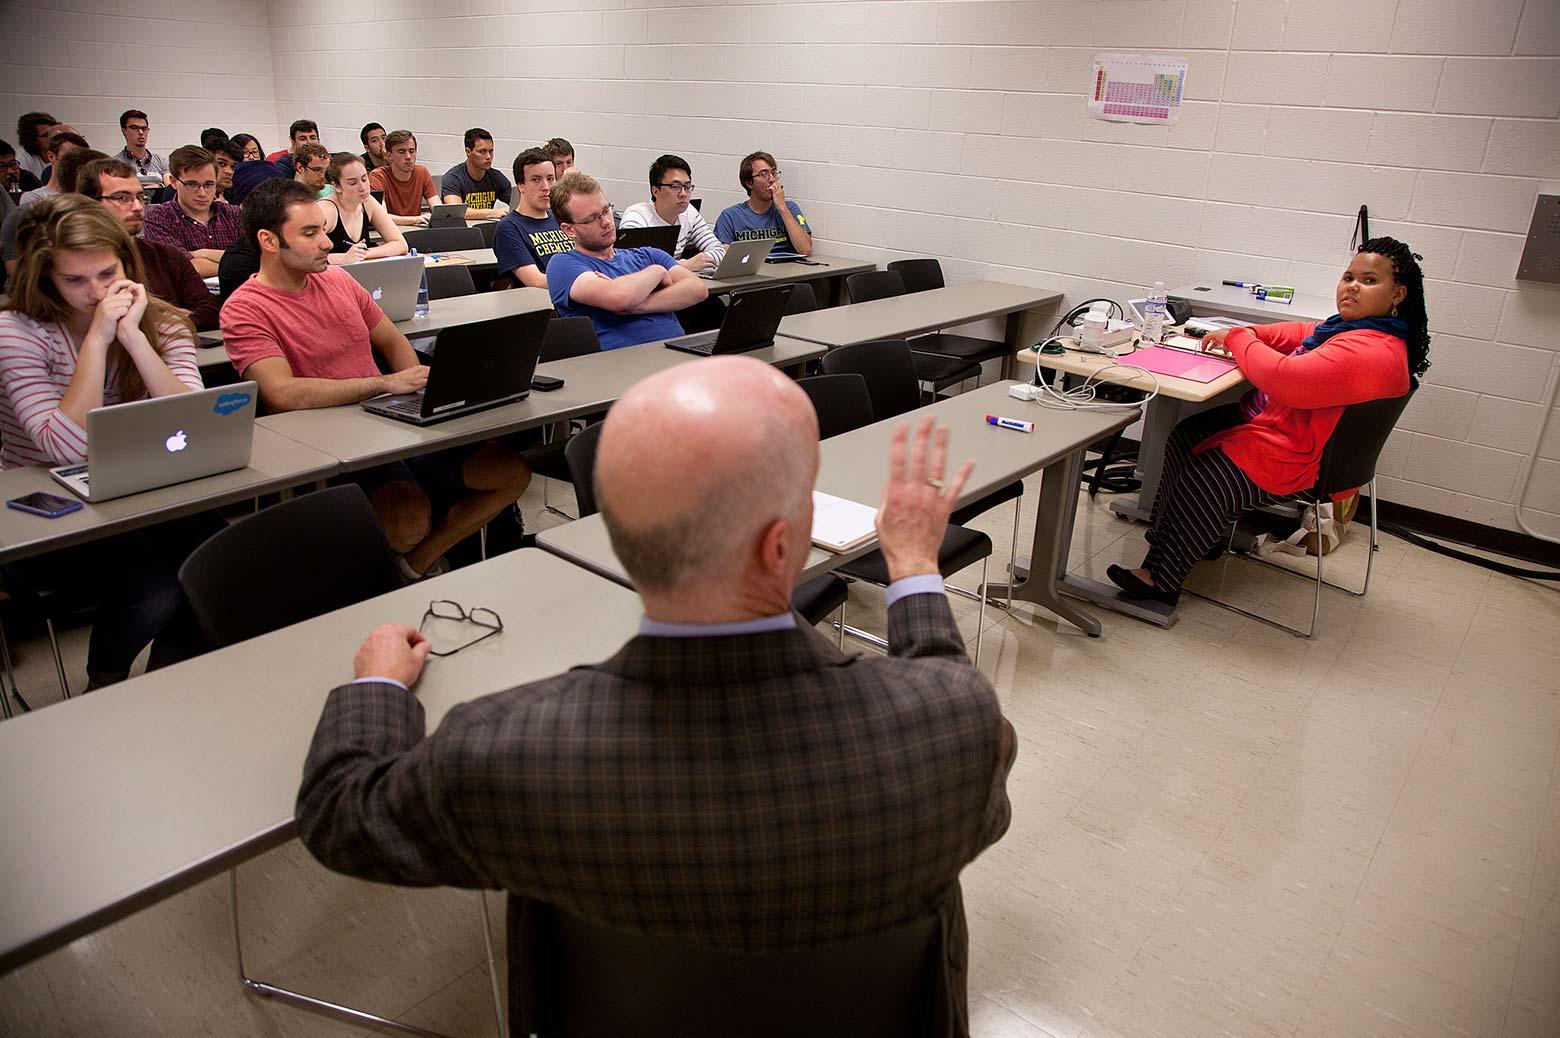 David Chesney speaks to his classroom